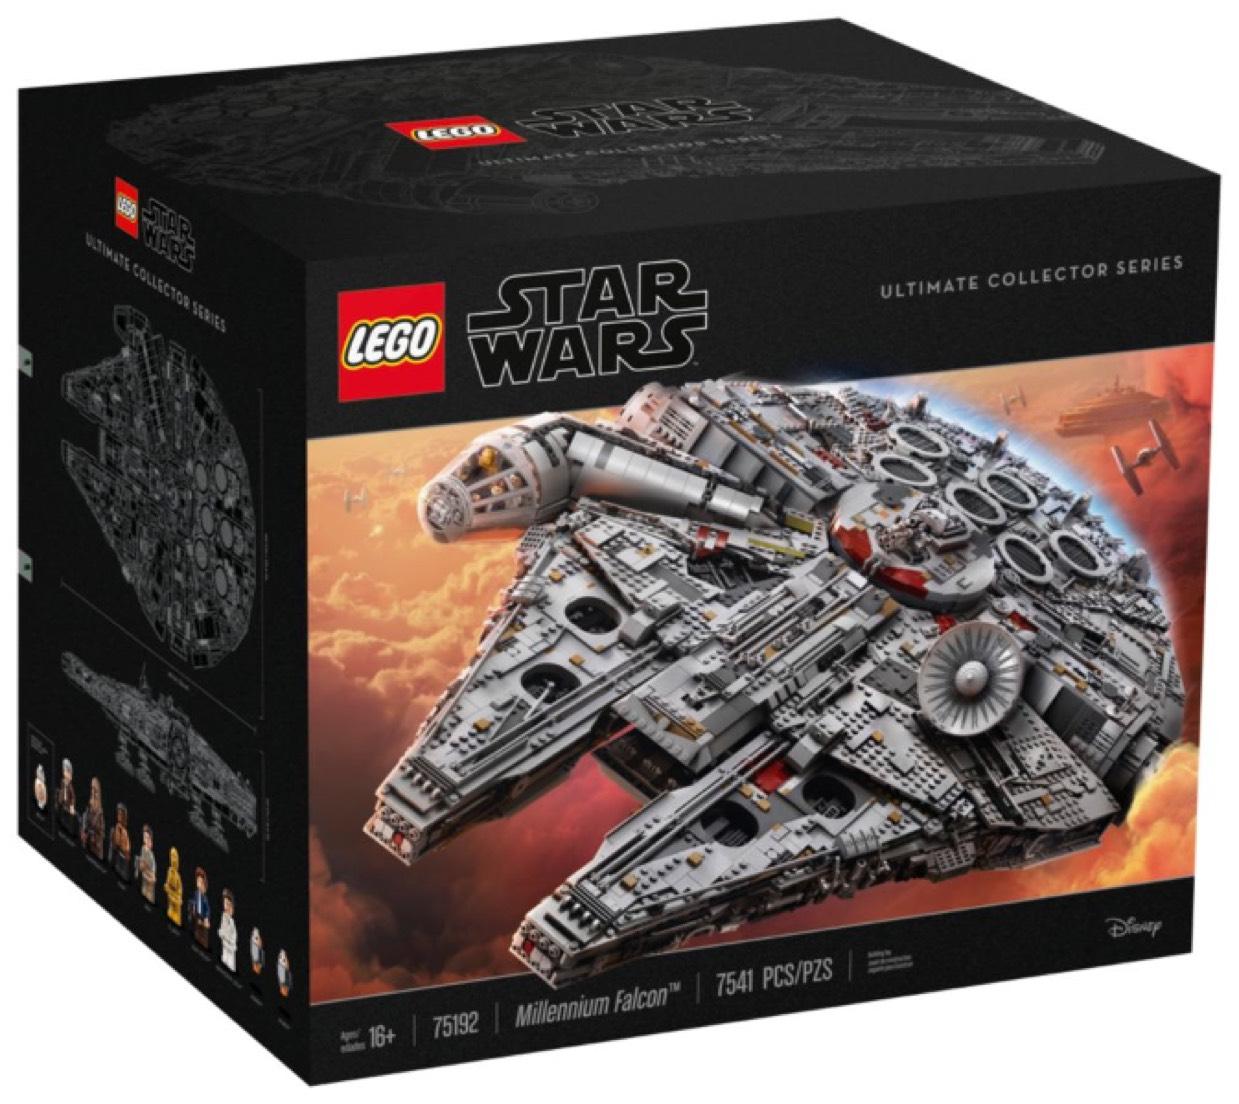 Lego UCS Millennium Falcon 75192 - £649.99 @ John Lewis